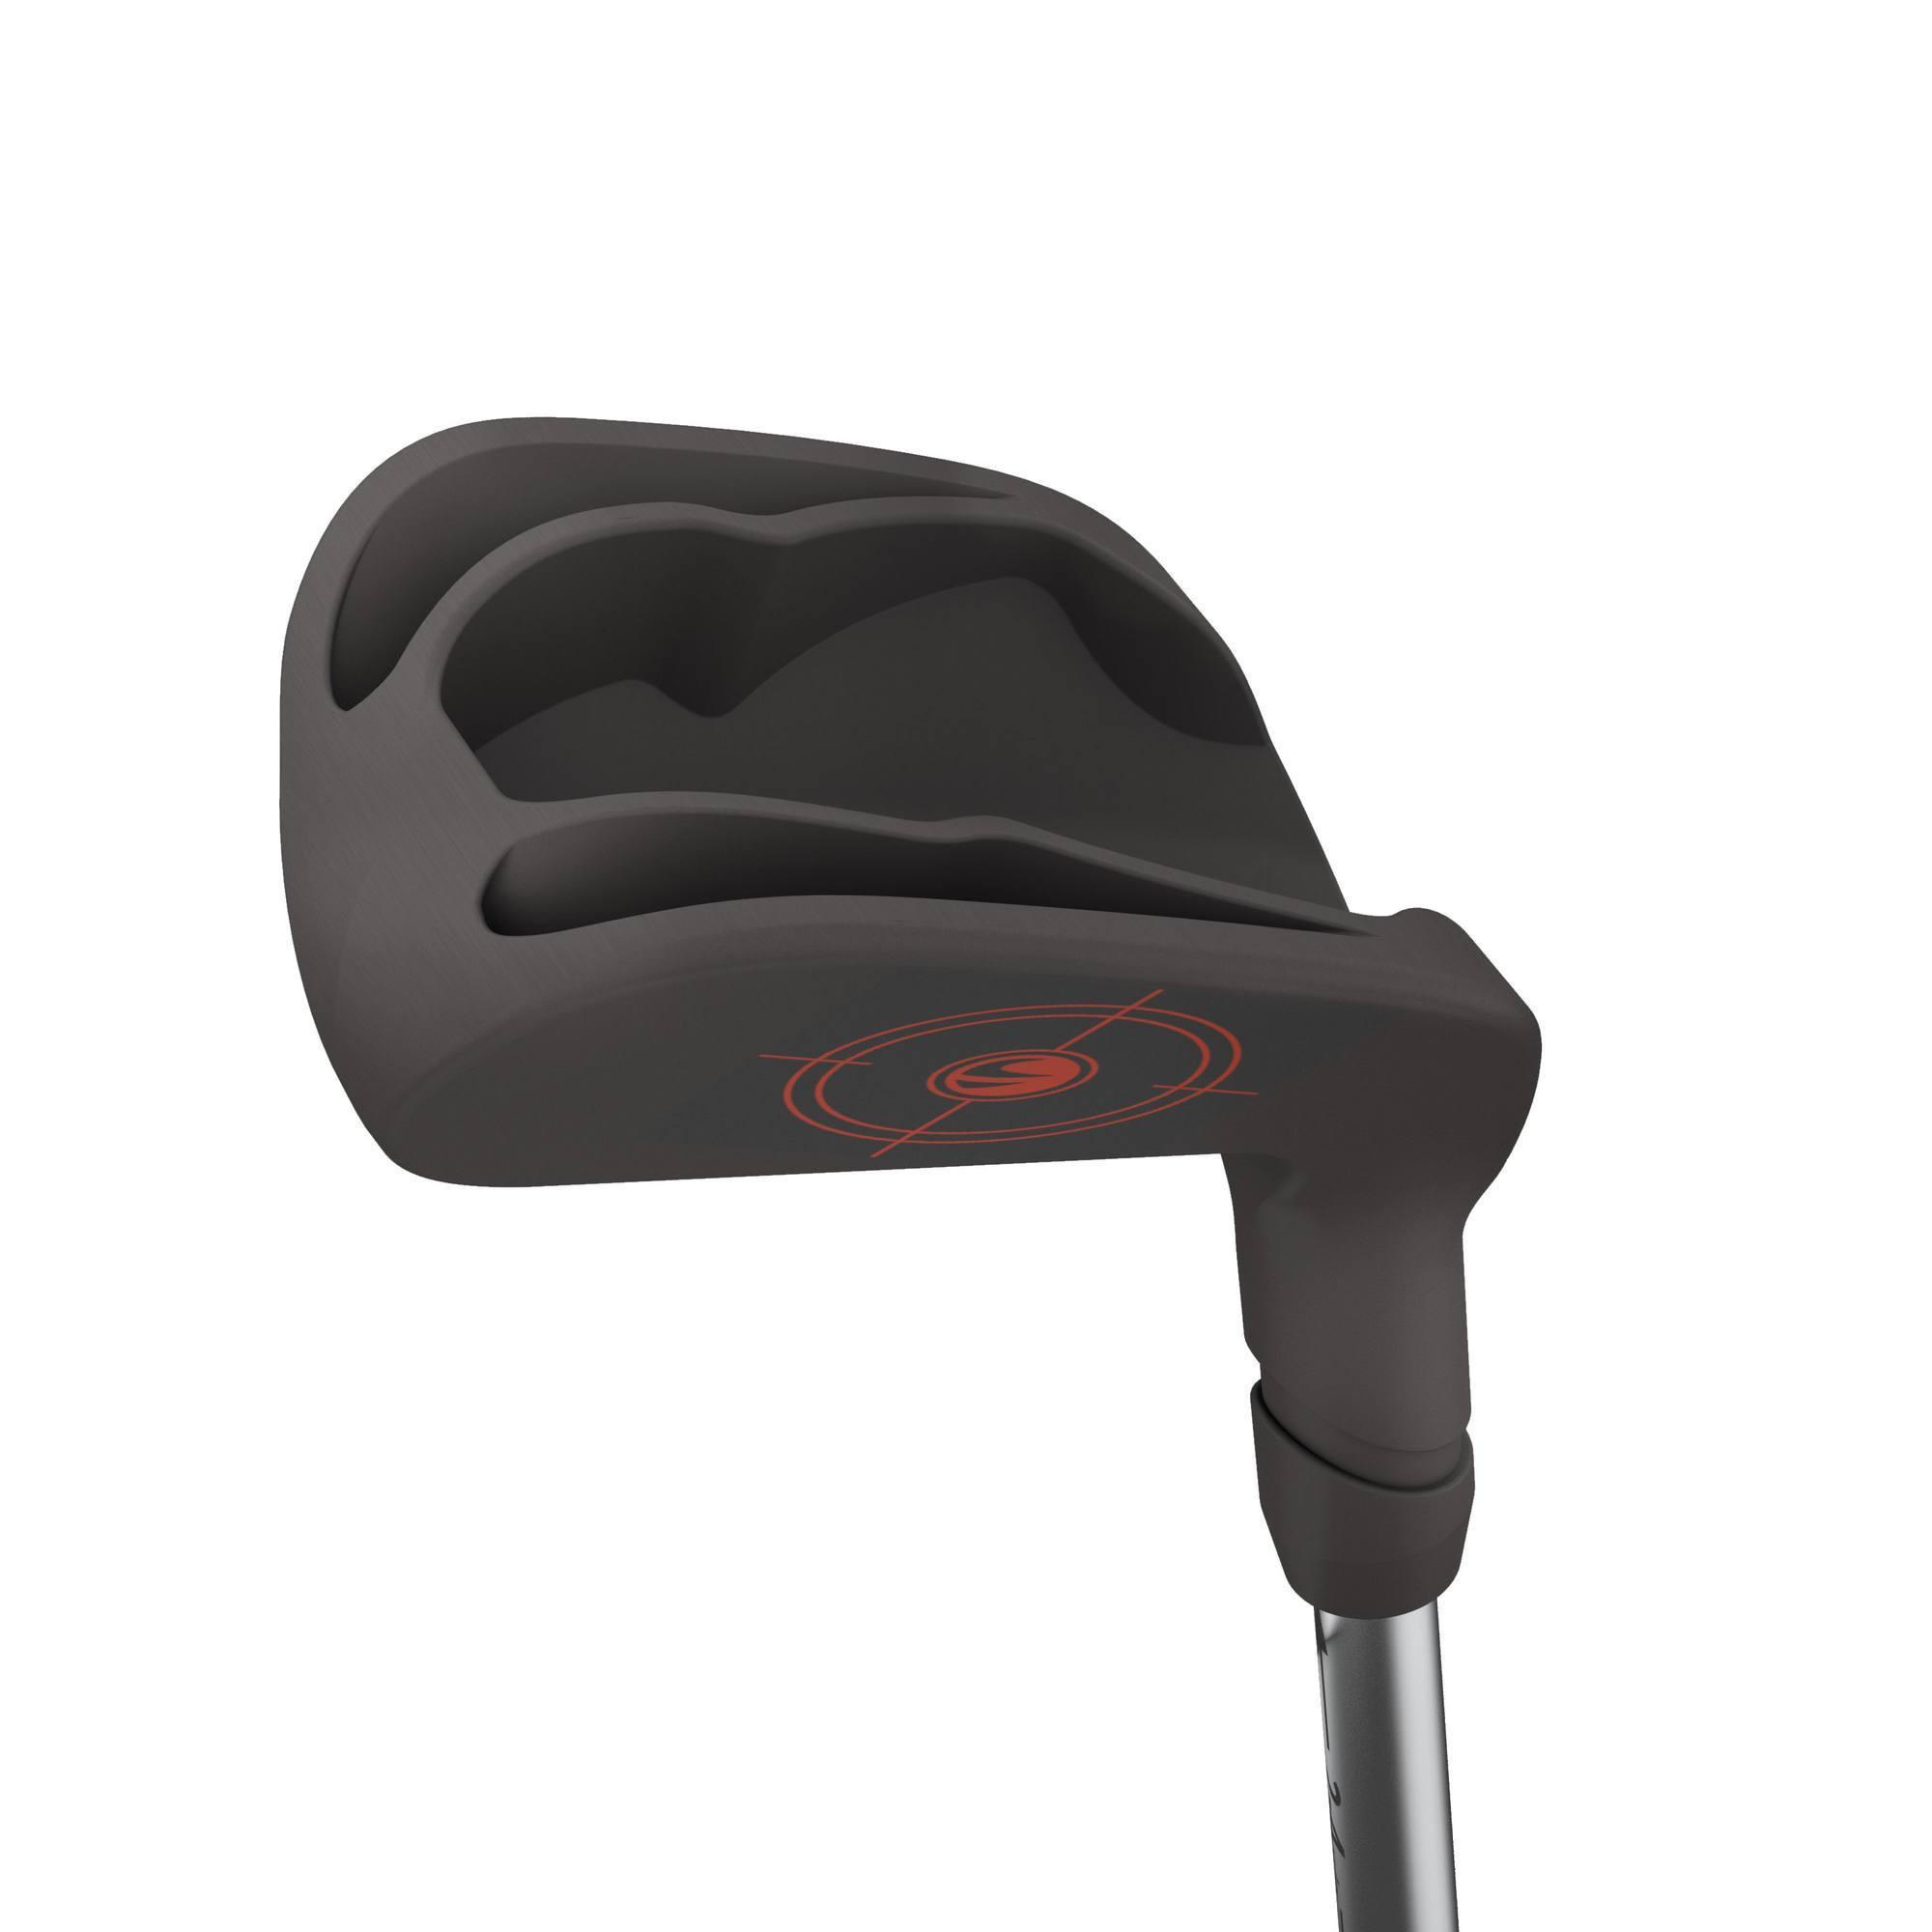 club de golf enfant 2 13 ans first club r glable clubs. Black Bedroom Furniture Sets. Home Design Ideas